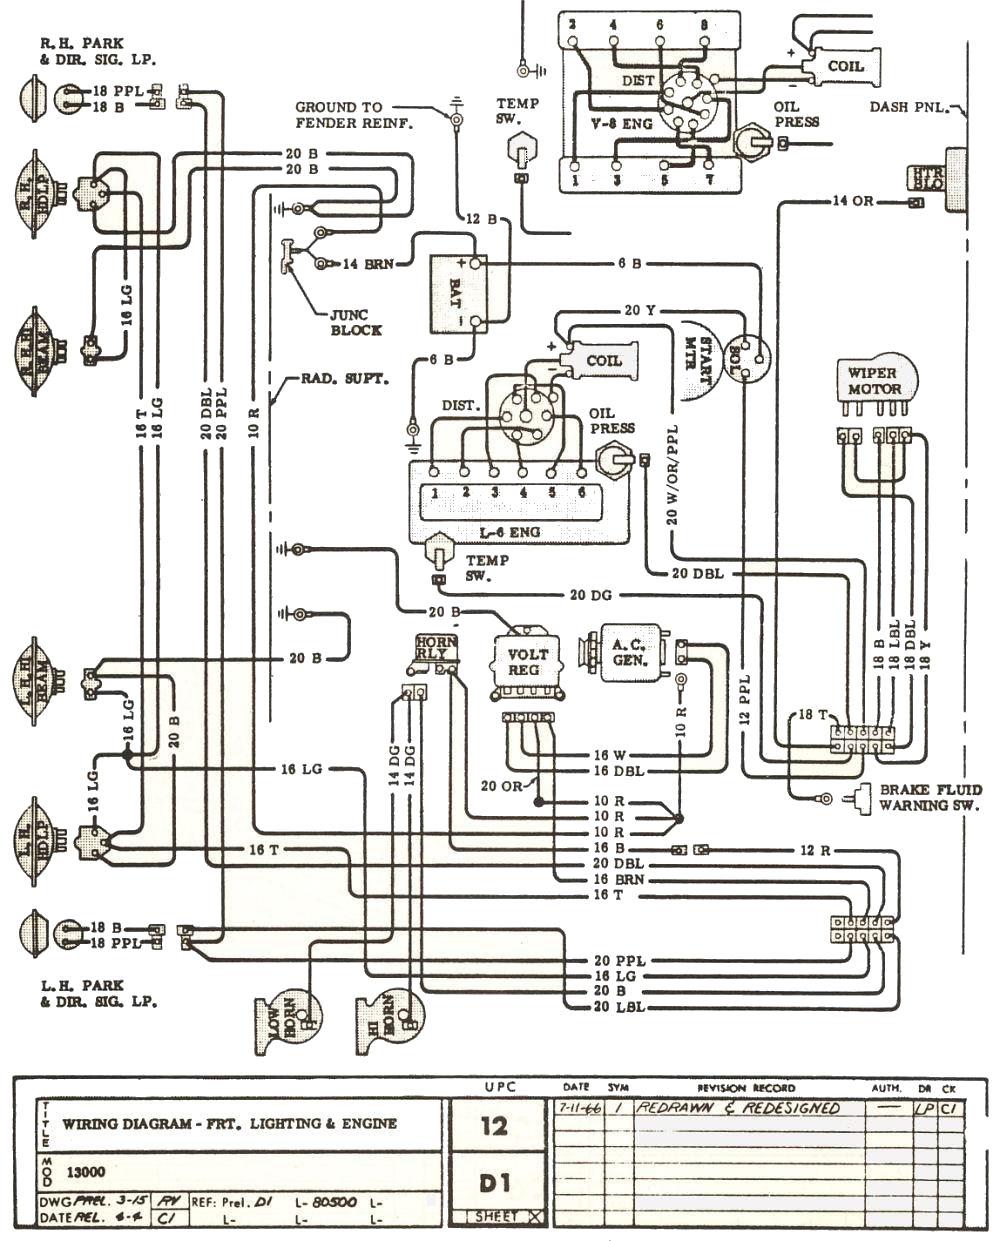 Ab 8772 1969 Chevelle Engine Wiring Diagram Wiring Diagram